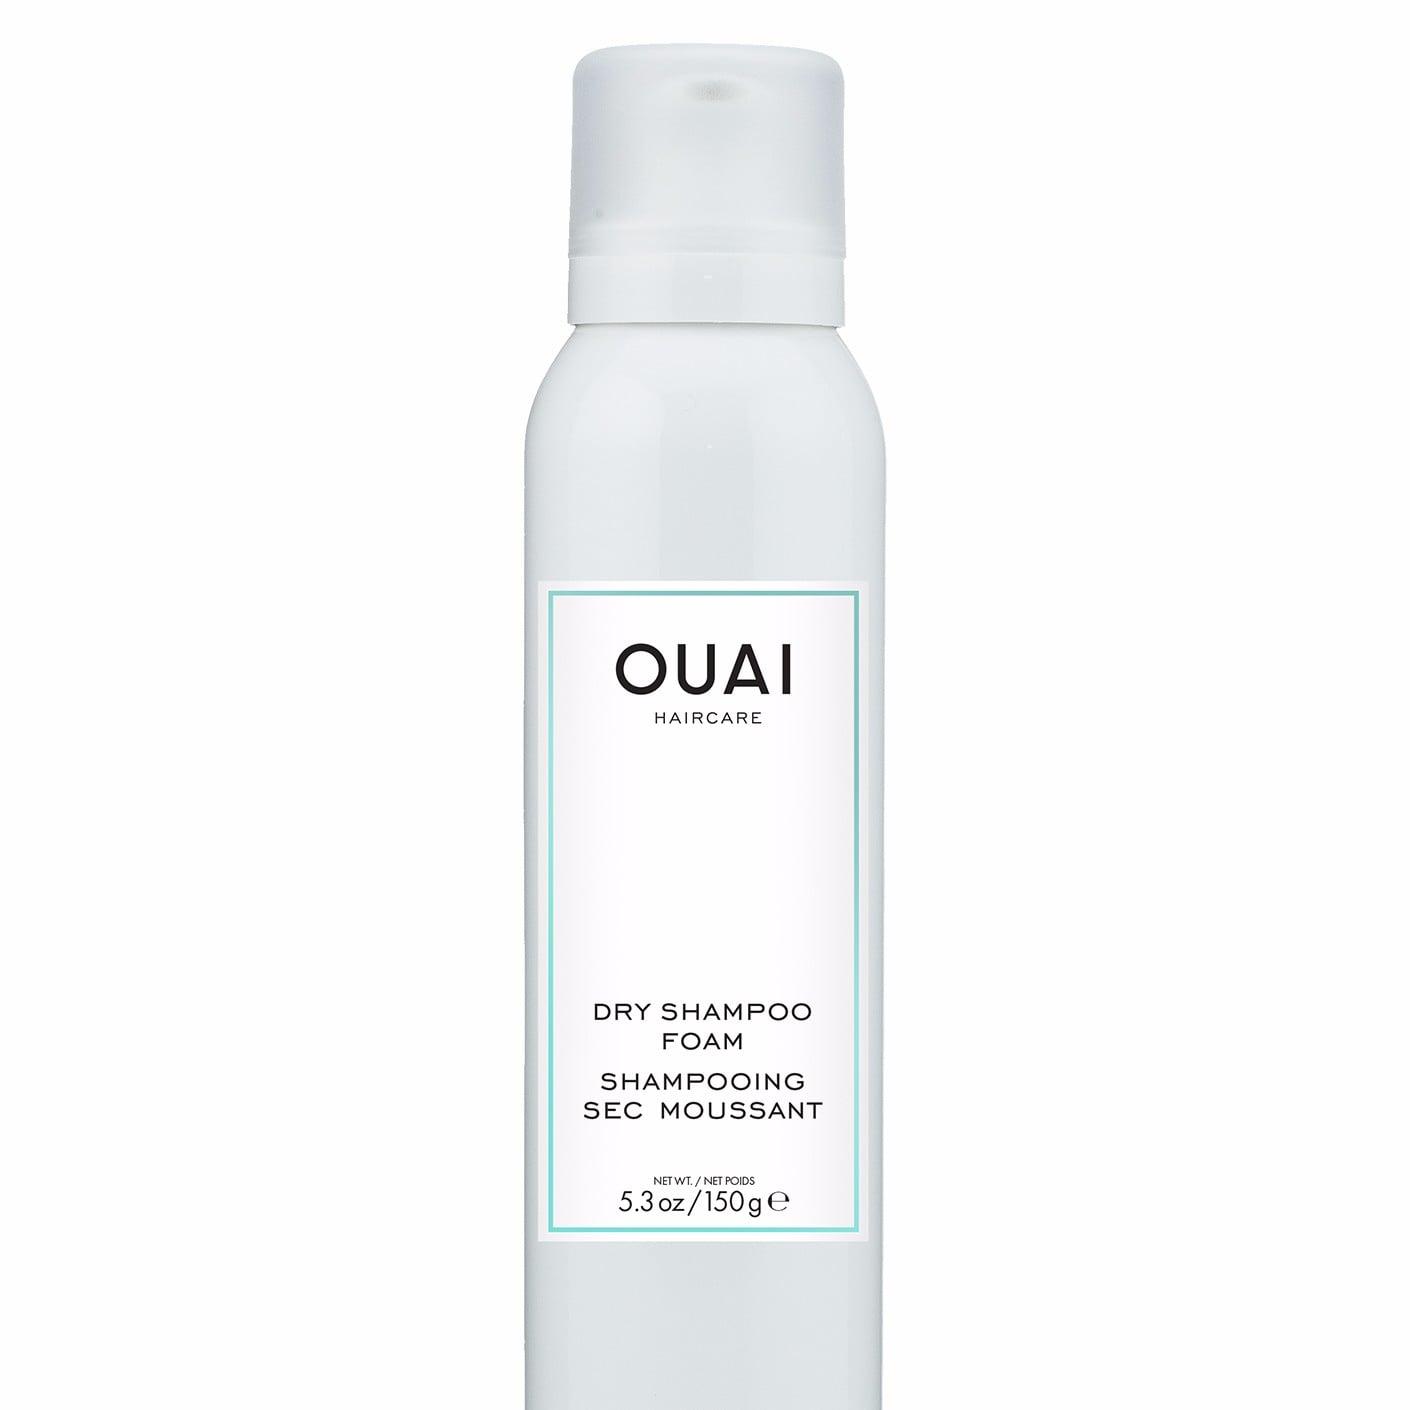 Image result for ouai dry shampoo foam uk